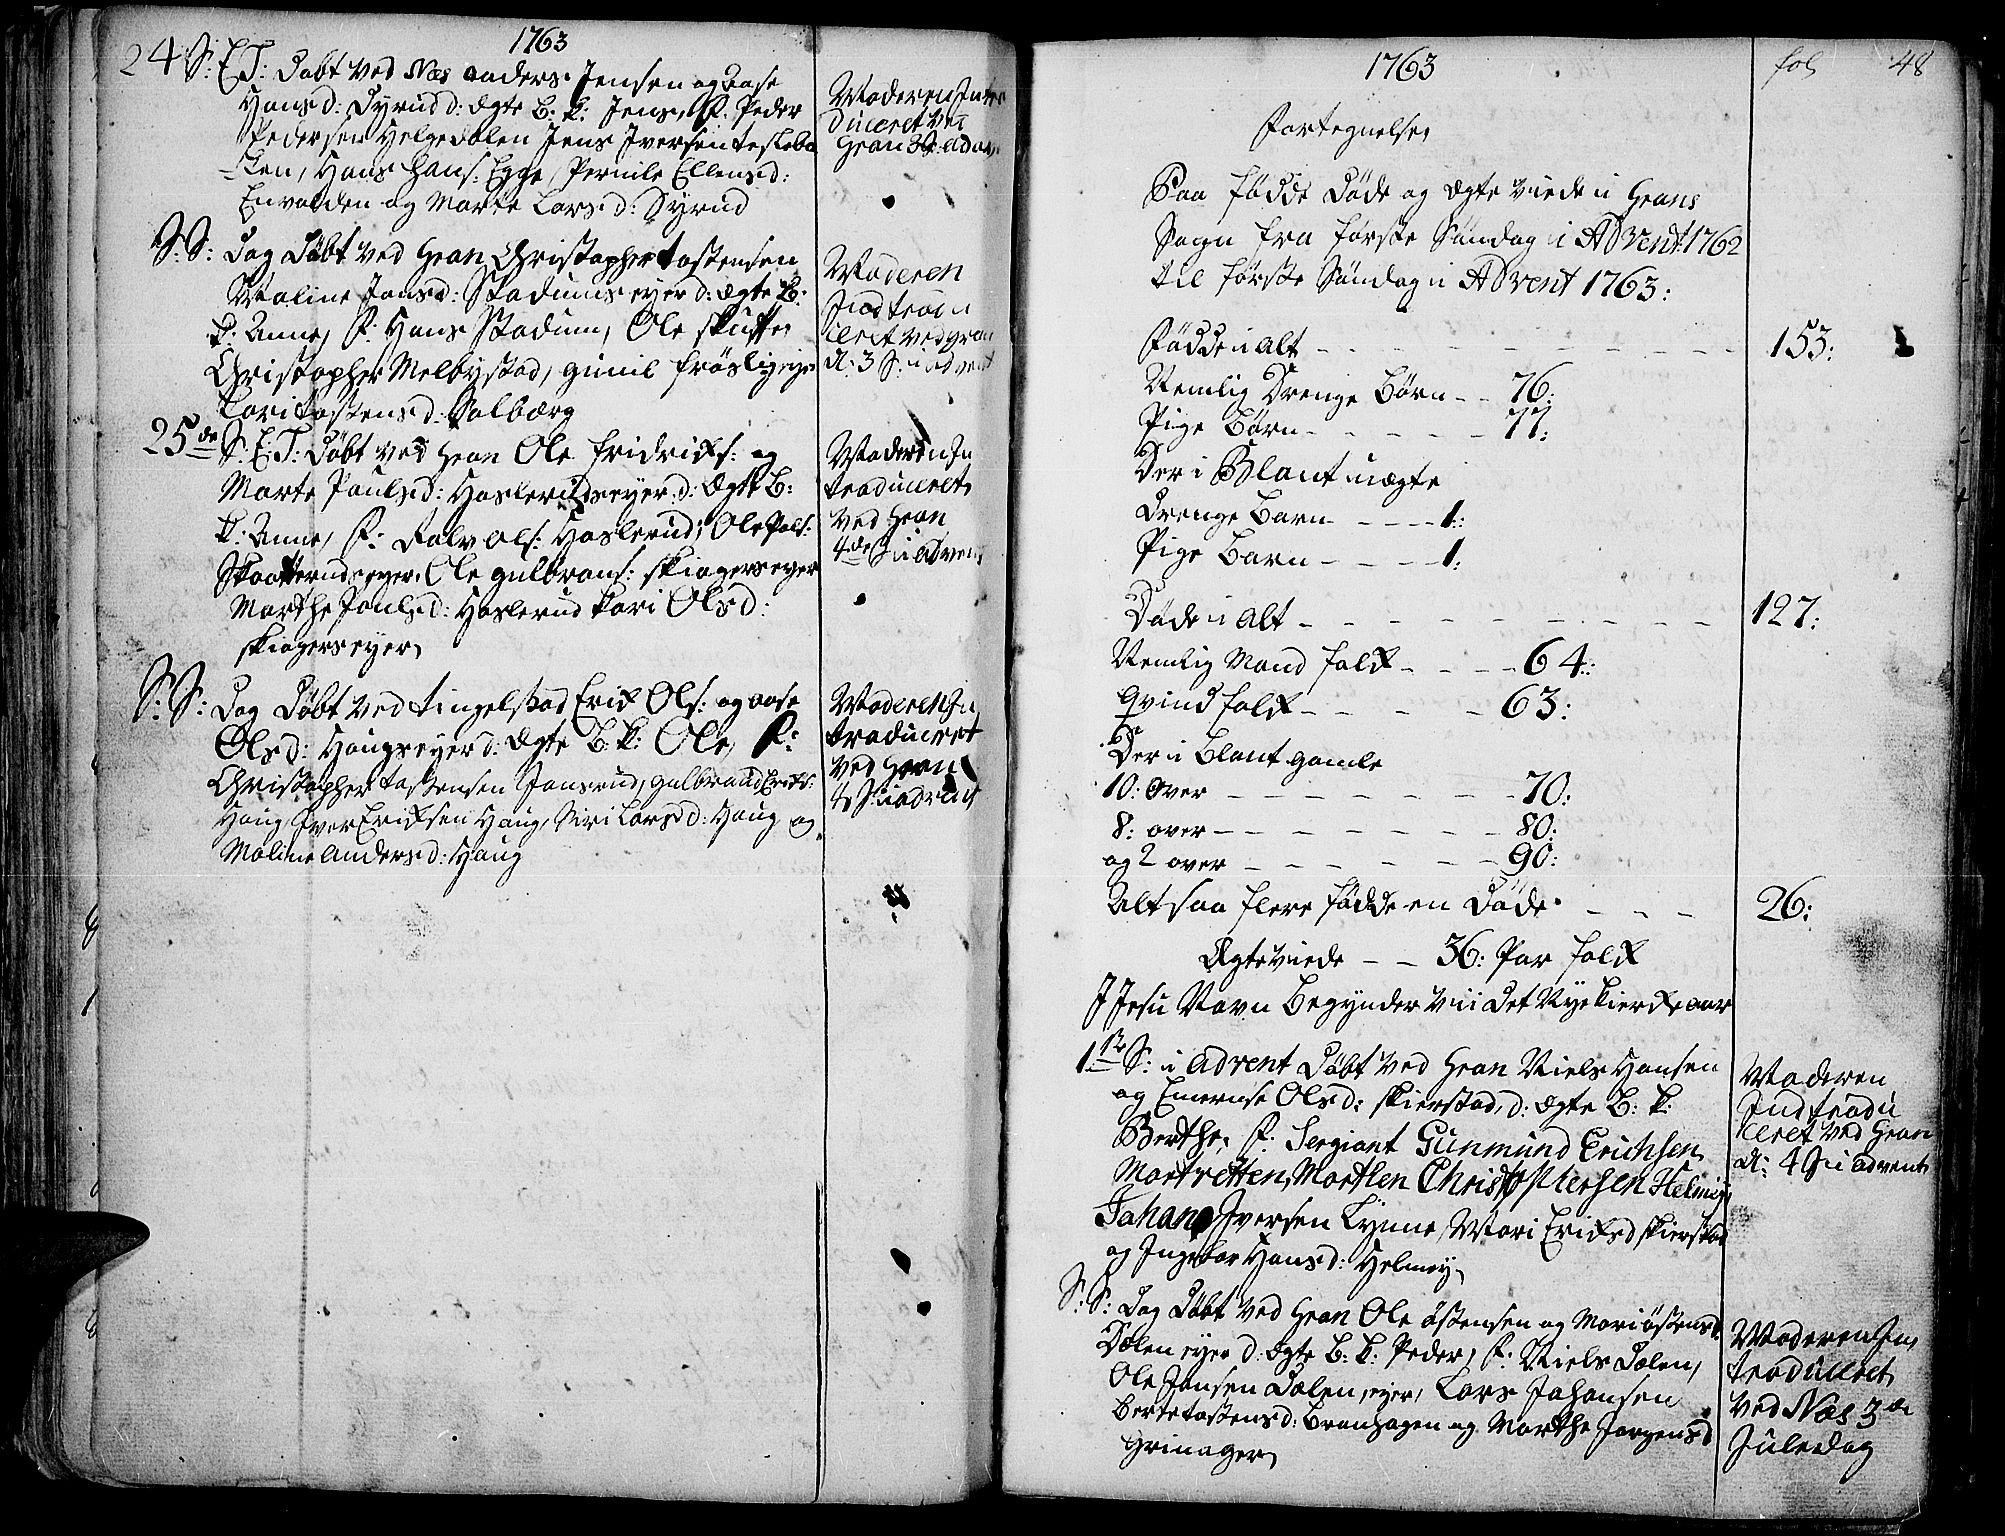 SAH, Gran prestekontor, Ministerialbok nr. 4, 1759-1775, s. 48